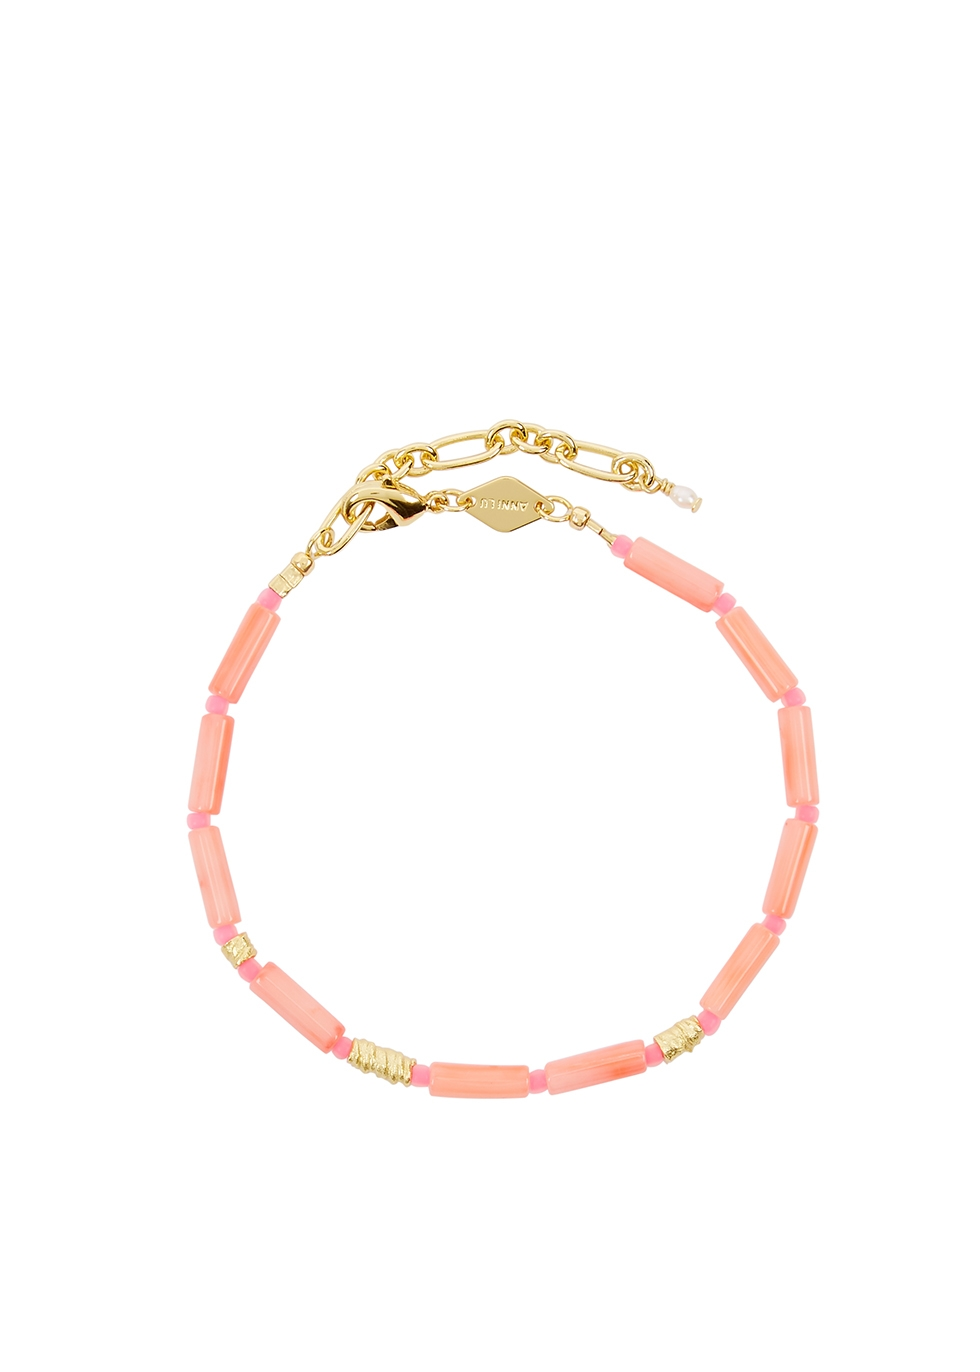 Malibu beaded 18kt gold-plated bracelet